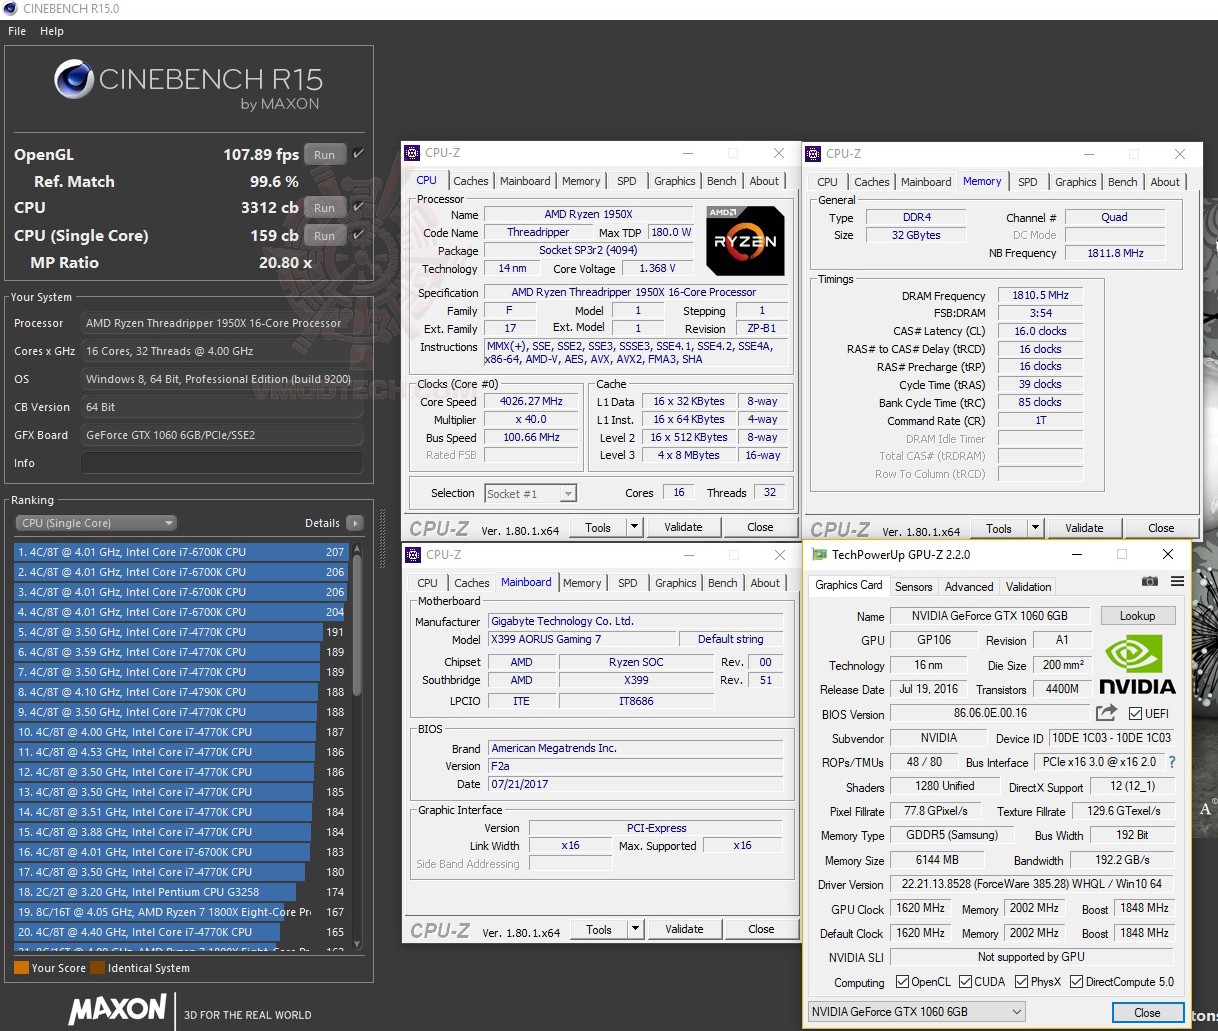 c15 36 G.SKILL Trident Z RGB DDR4 3200MHz 32GB (8GBx4) Quad Channel Review